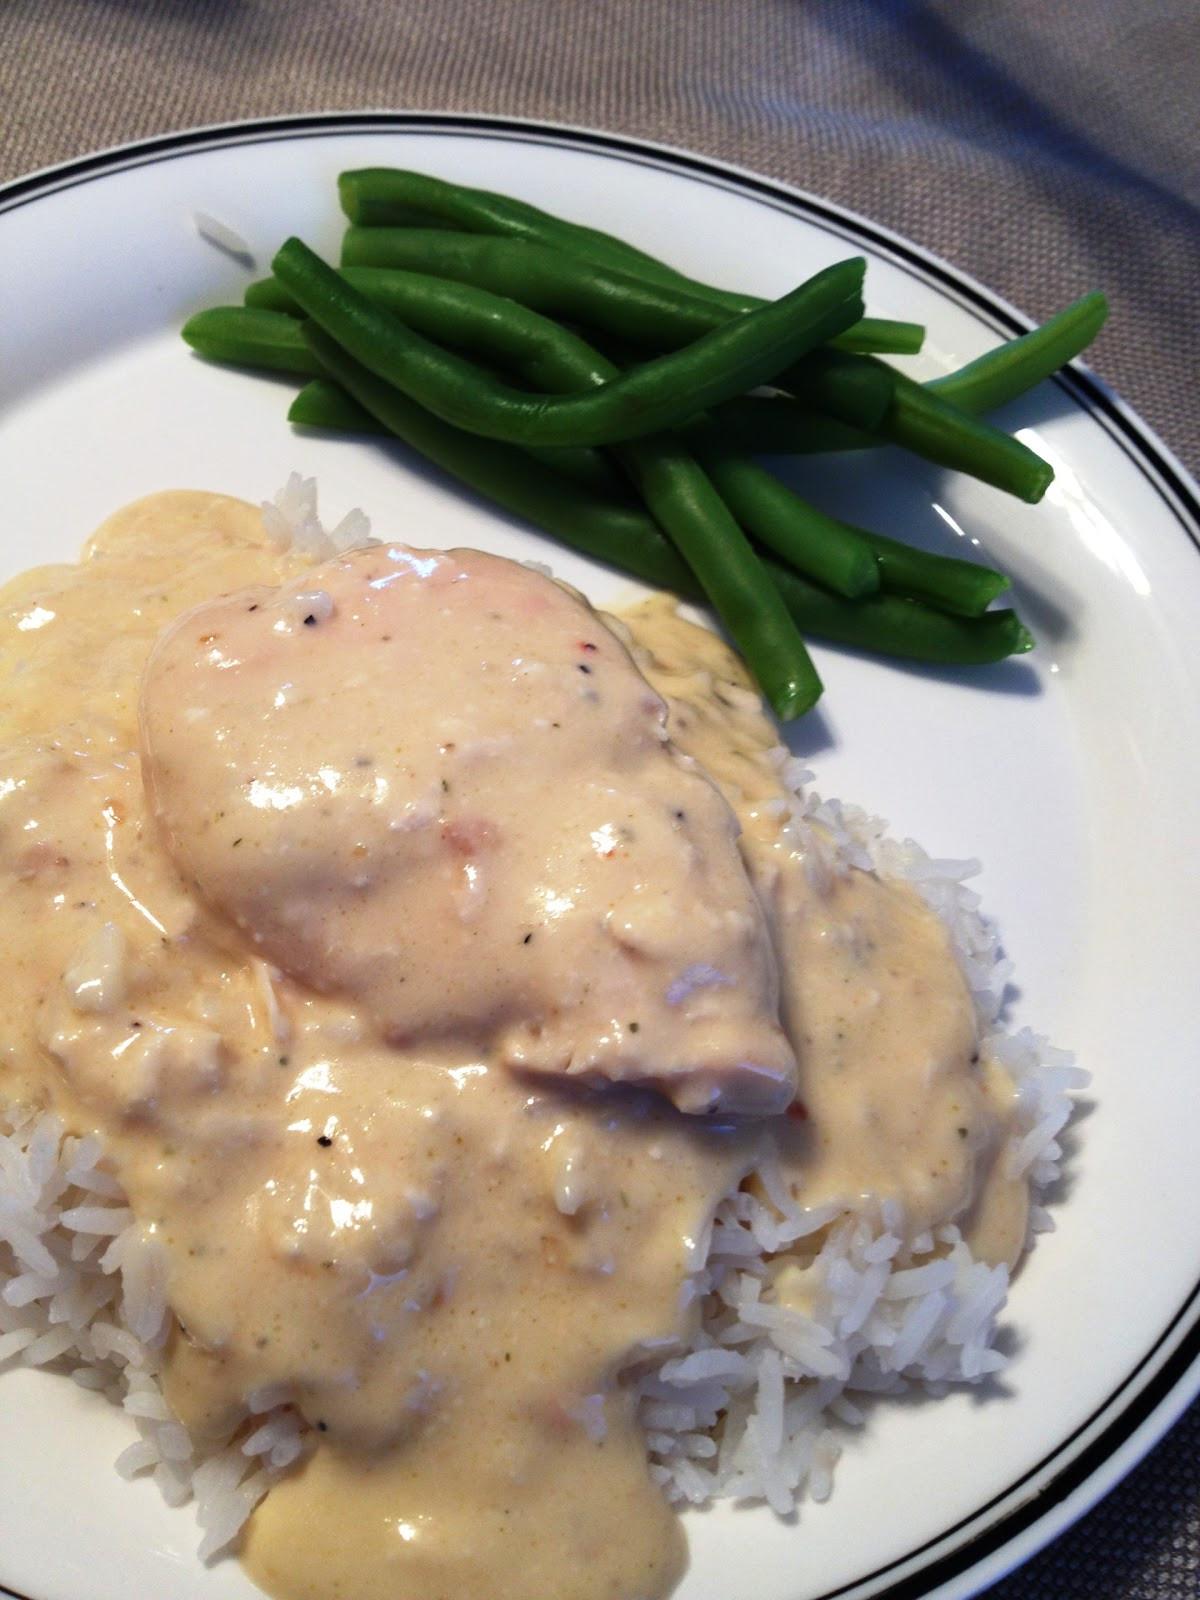 Crockpot Chicken Recipes With Cream Of Mushroom Soup  Adventures Creamy Crock Pot Chicken